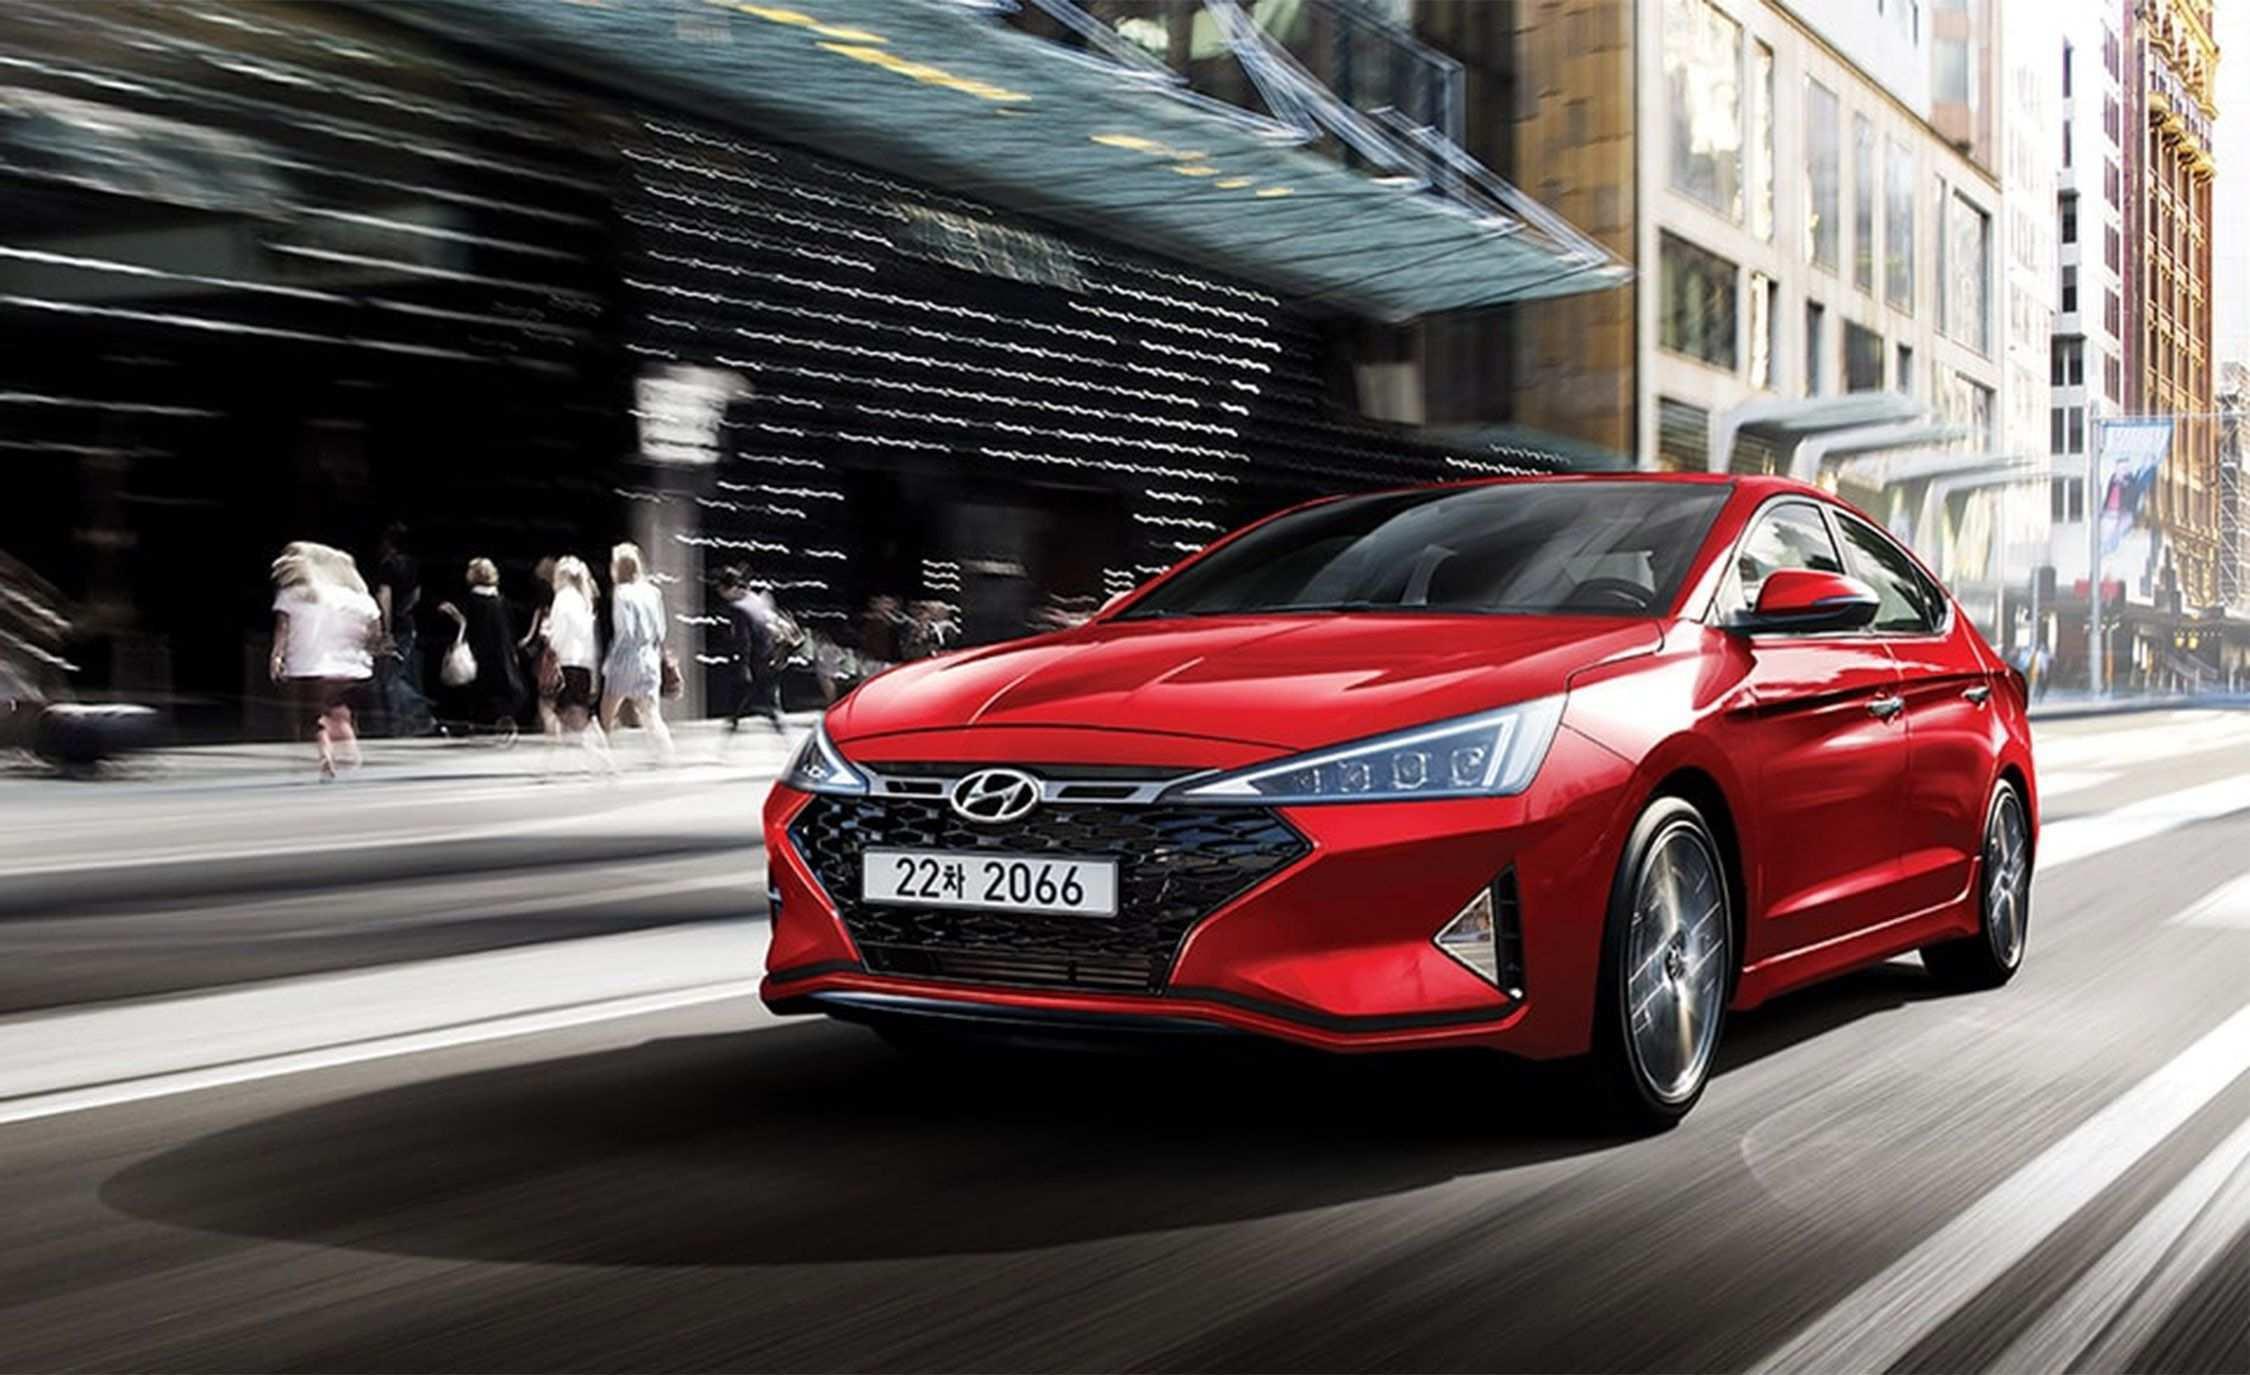 58 New 2020 Hyundai Elantra Price with 2020 Hyundai Elantra